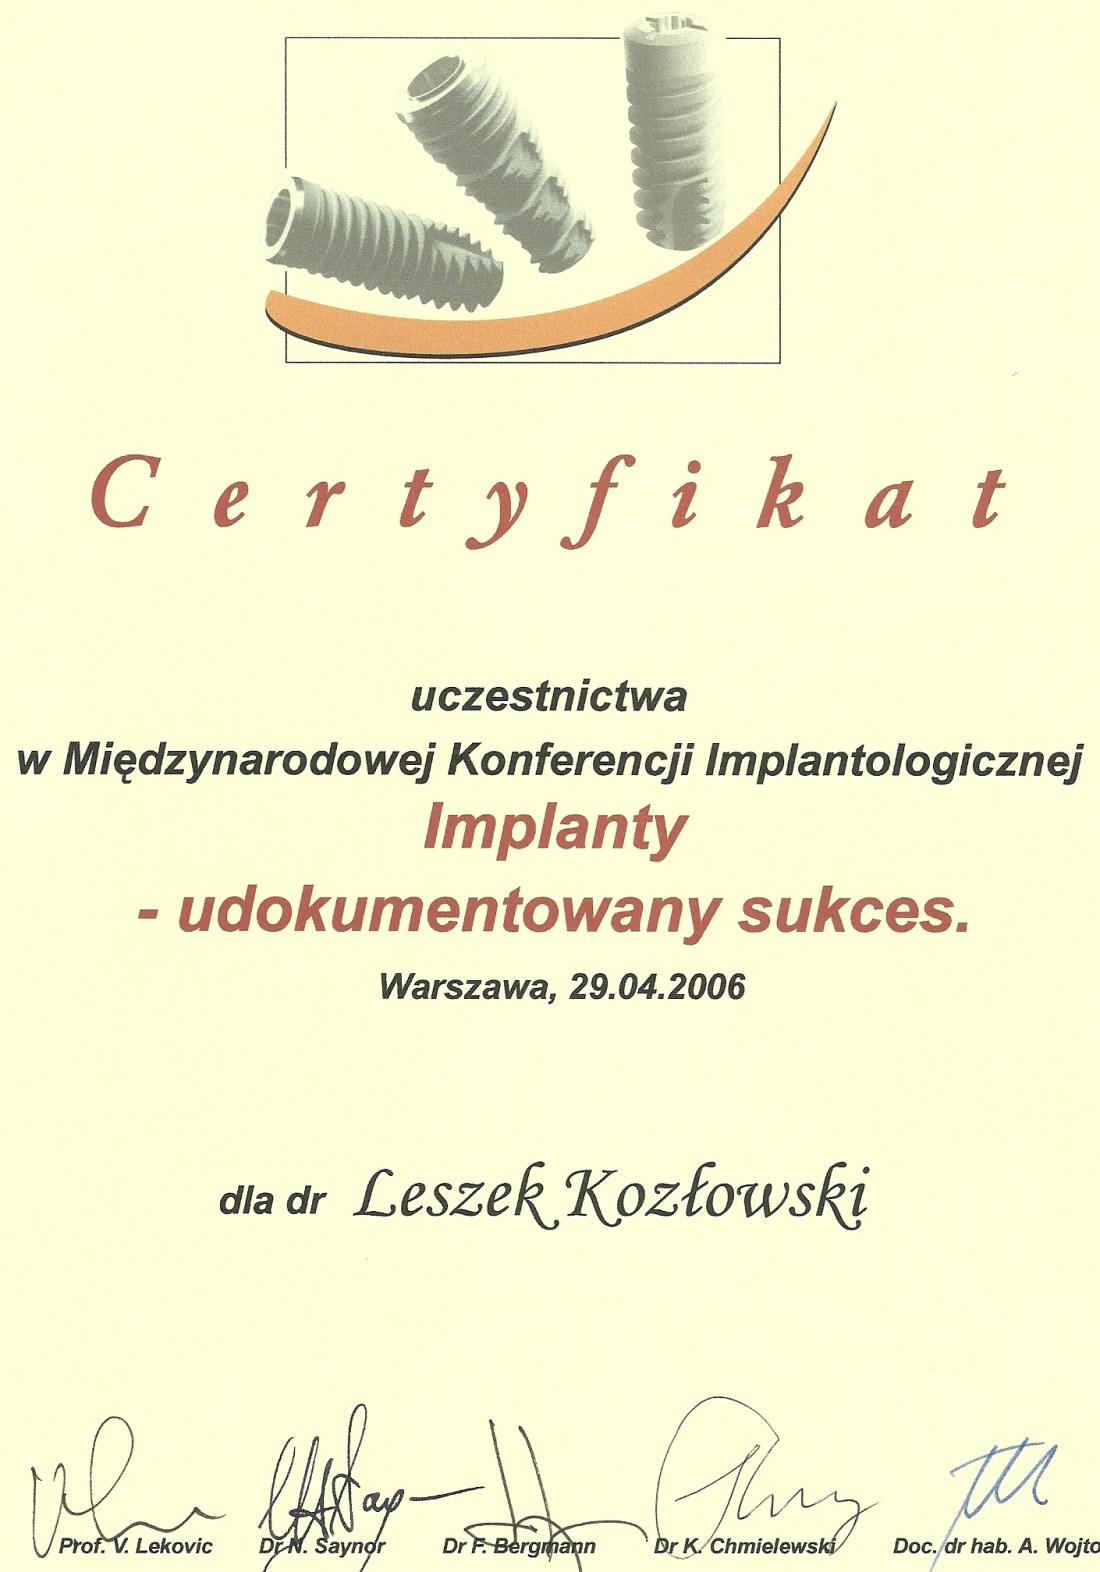 dentysta warszawa DENTYSTA WARSZAWA – DENTOKLINIKA Dentysta warszawa Leszek Kozlowski Certyfikat 12